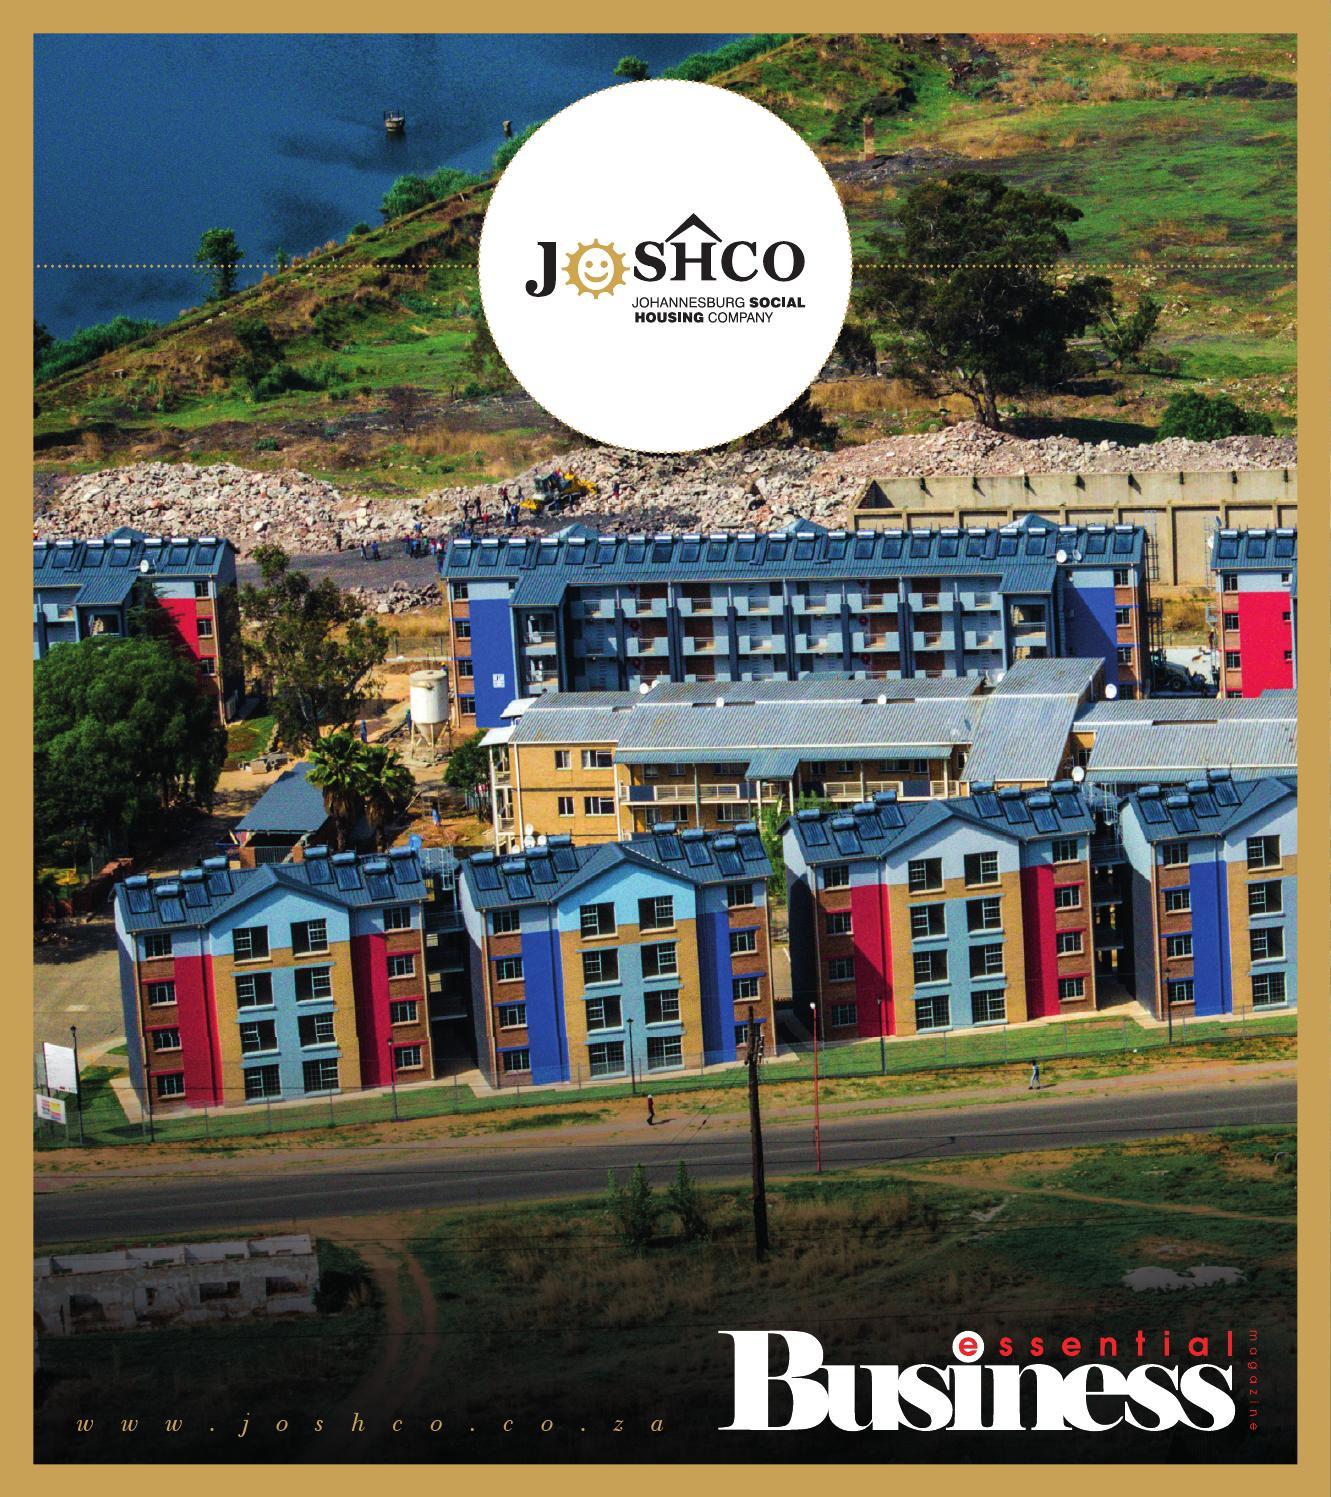 JOSHCO By Essential Business